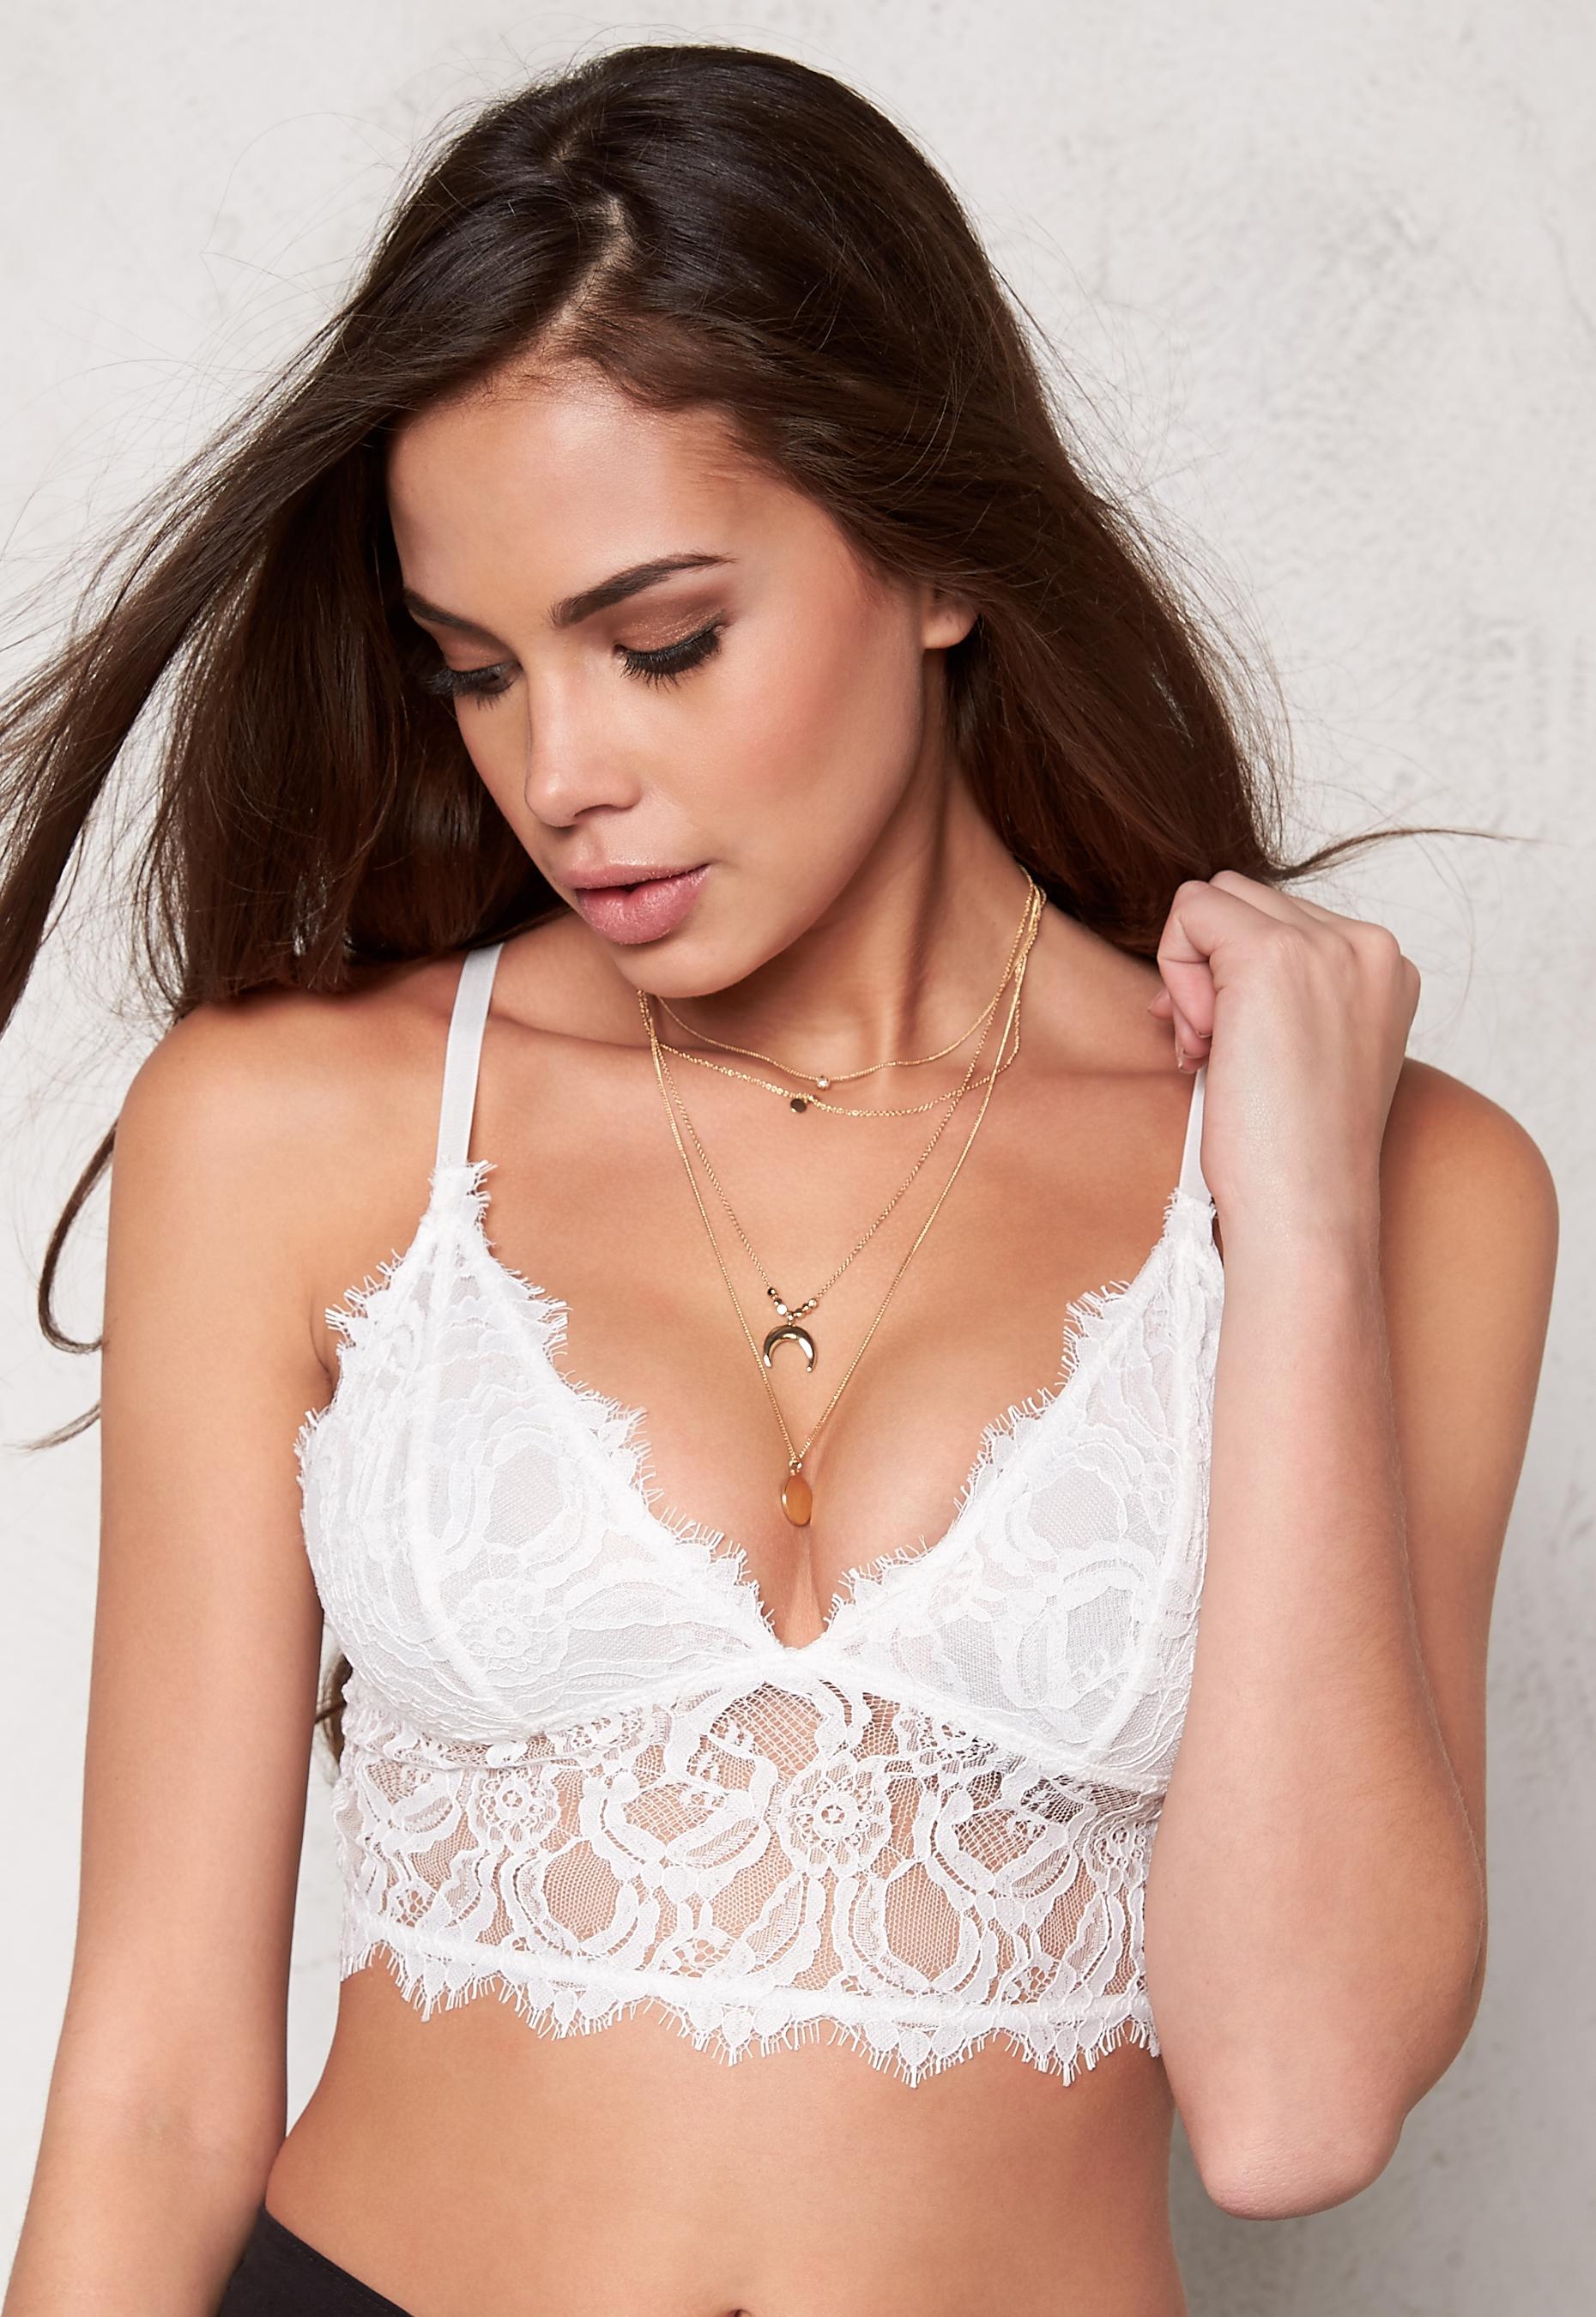 f9479a95b2 77thFLEA Melody lace bustier White - Bubbleroom